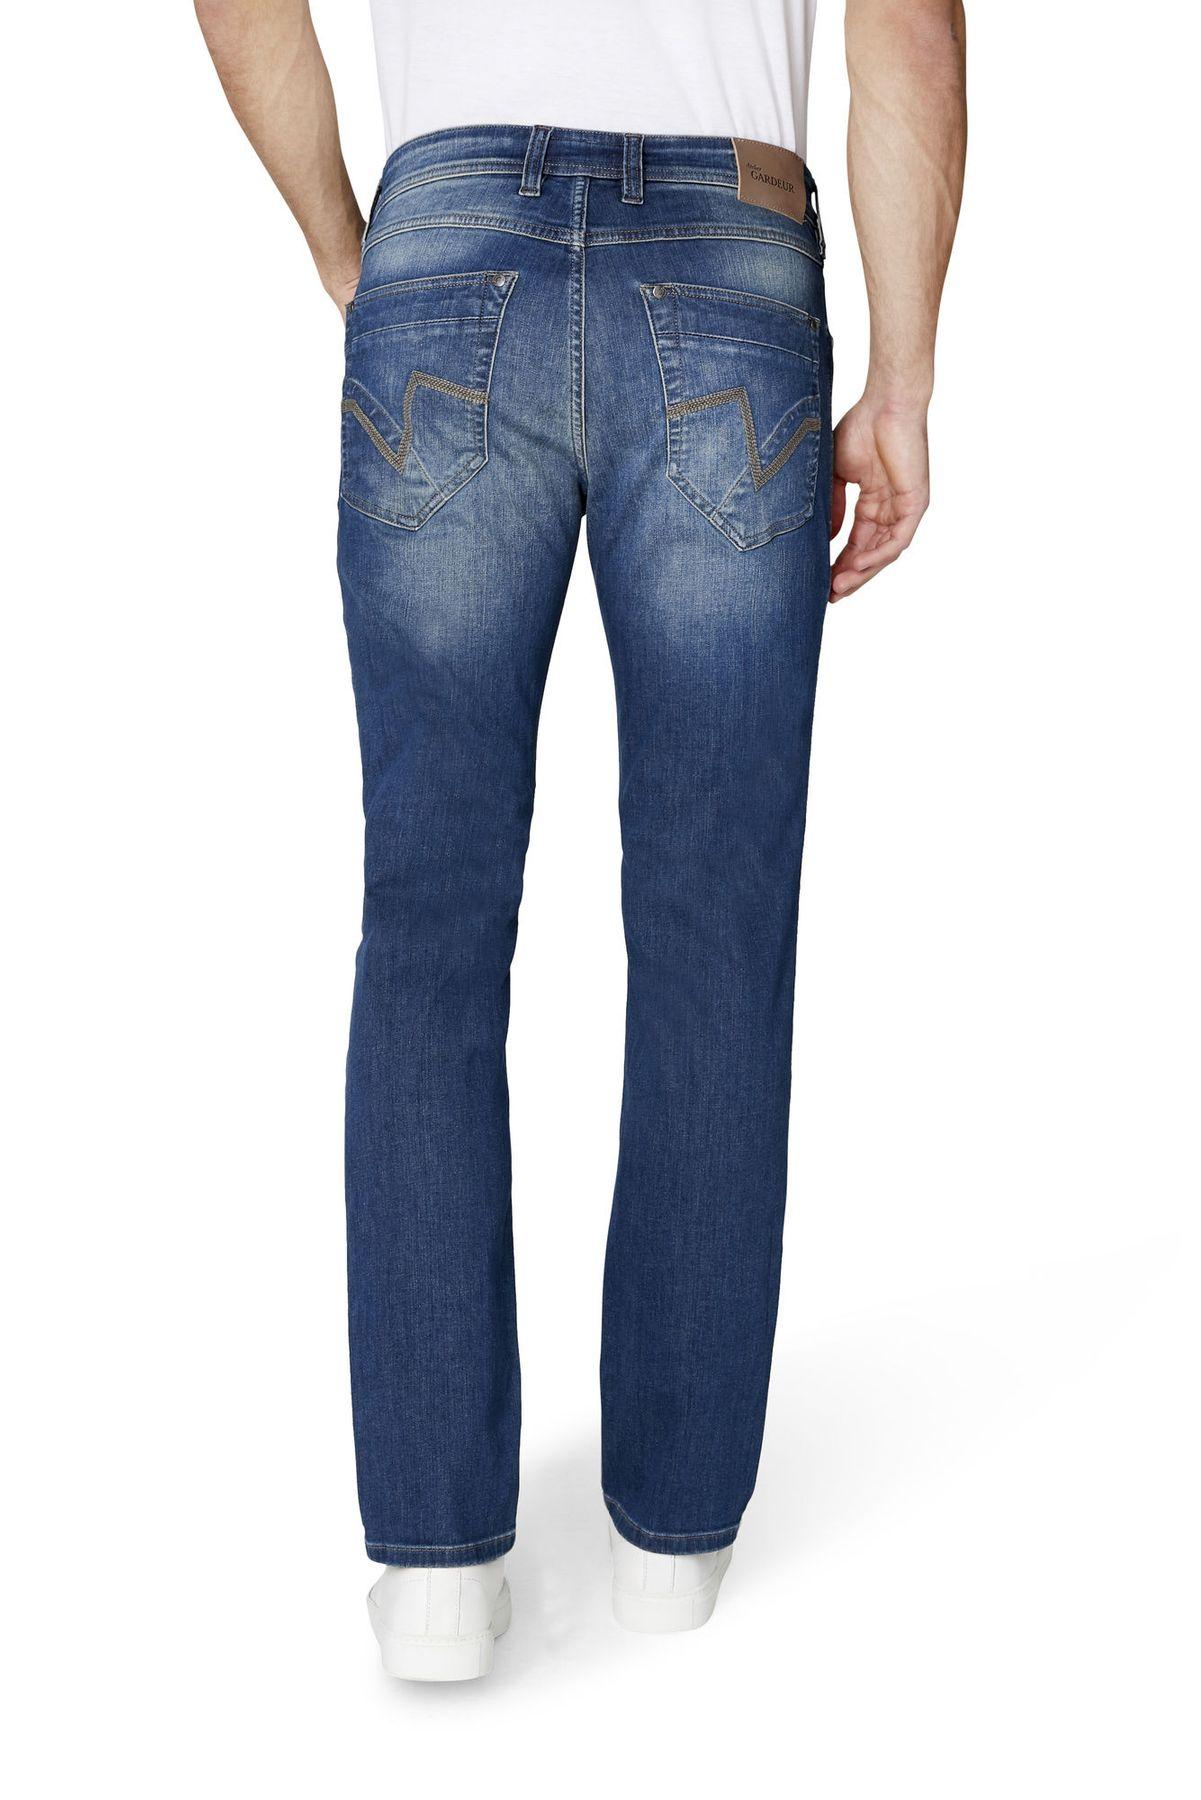 Atelier Gardeur - Modern Fit - Herren 5-Pocket Jeans, Denimstretch, Bill-8 (470391) – Bild 15